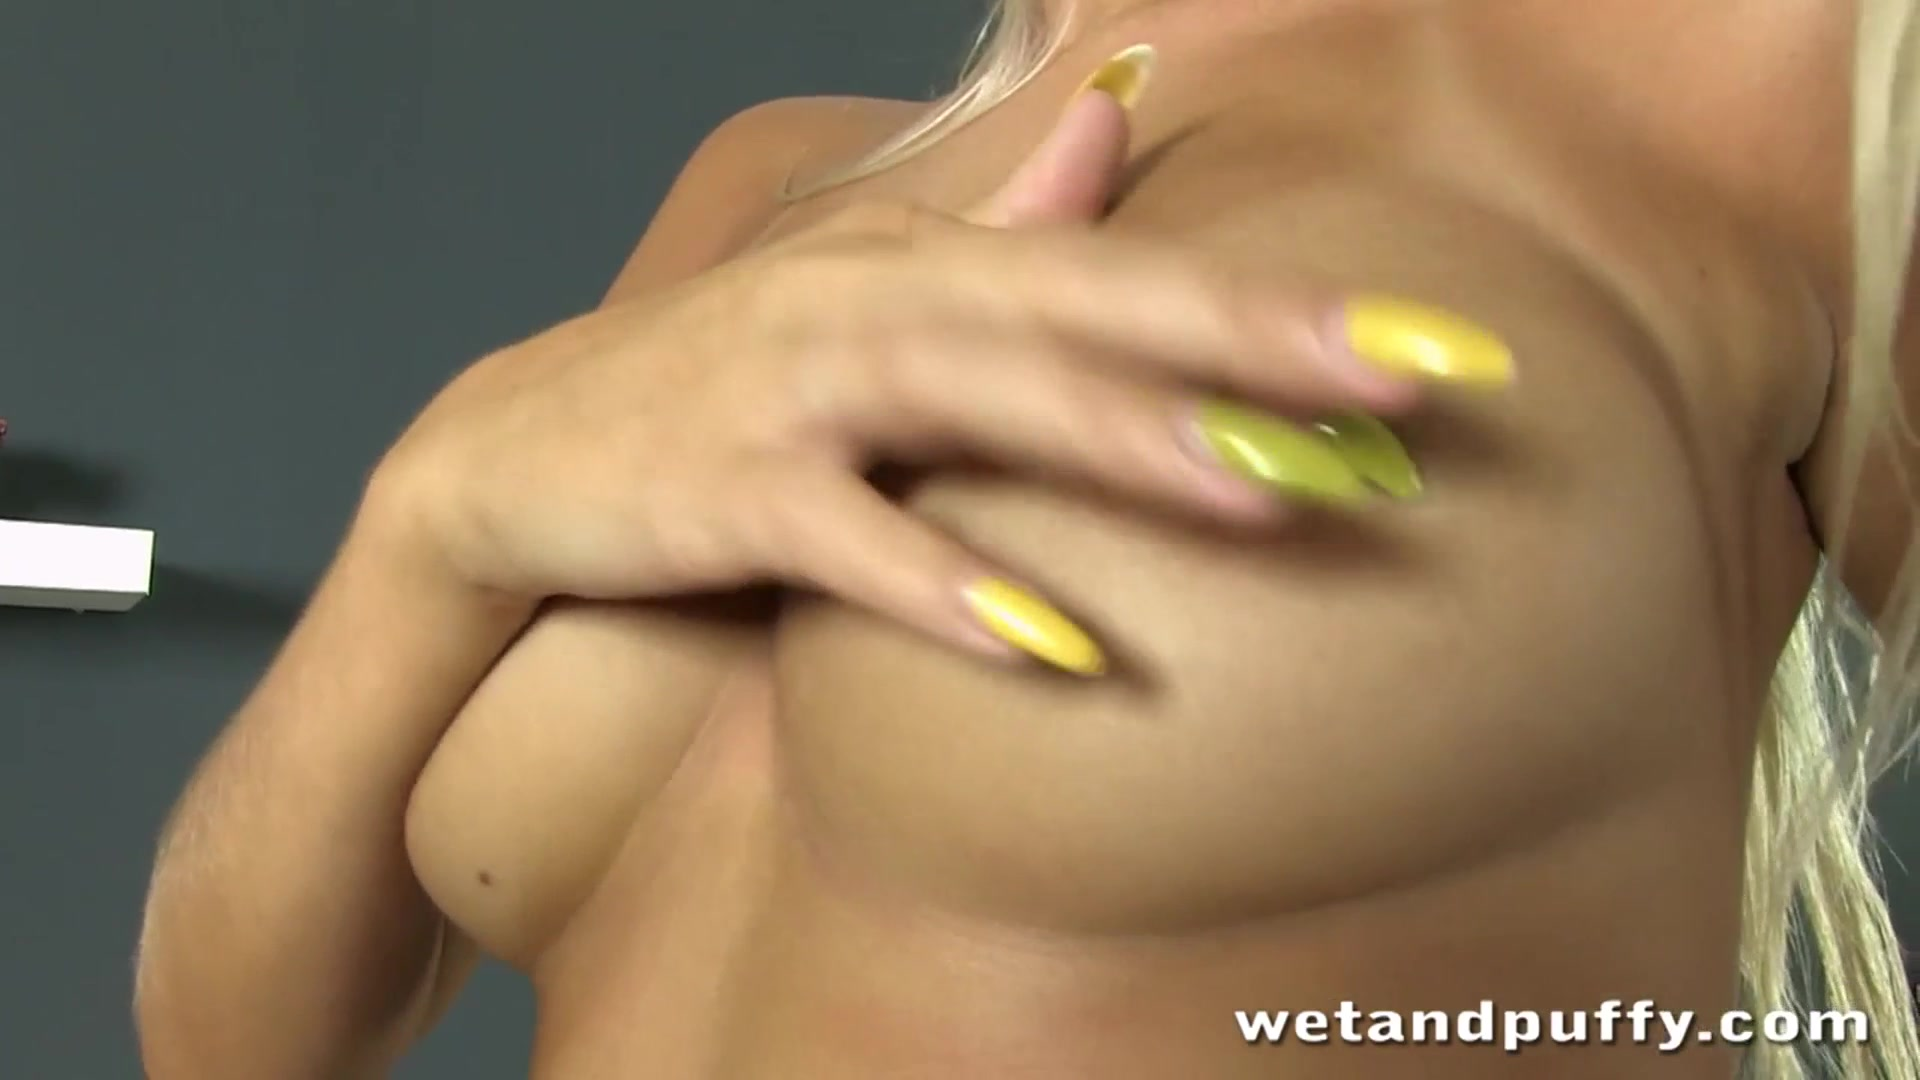 xxx pics Hot snapchat videos